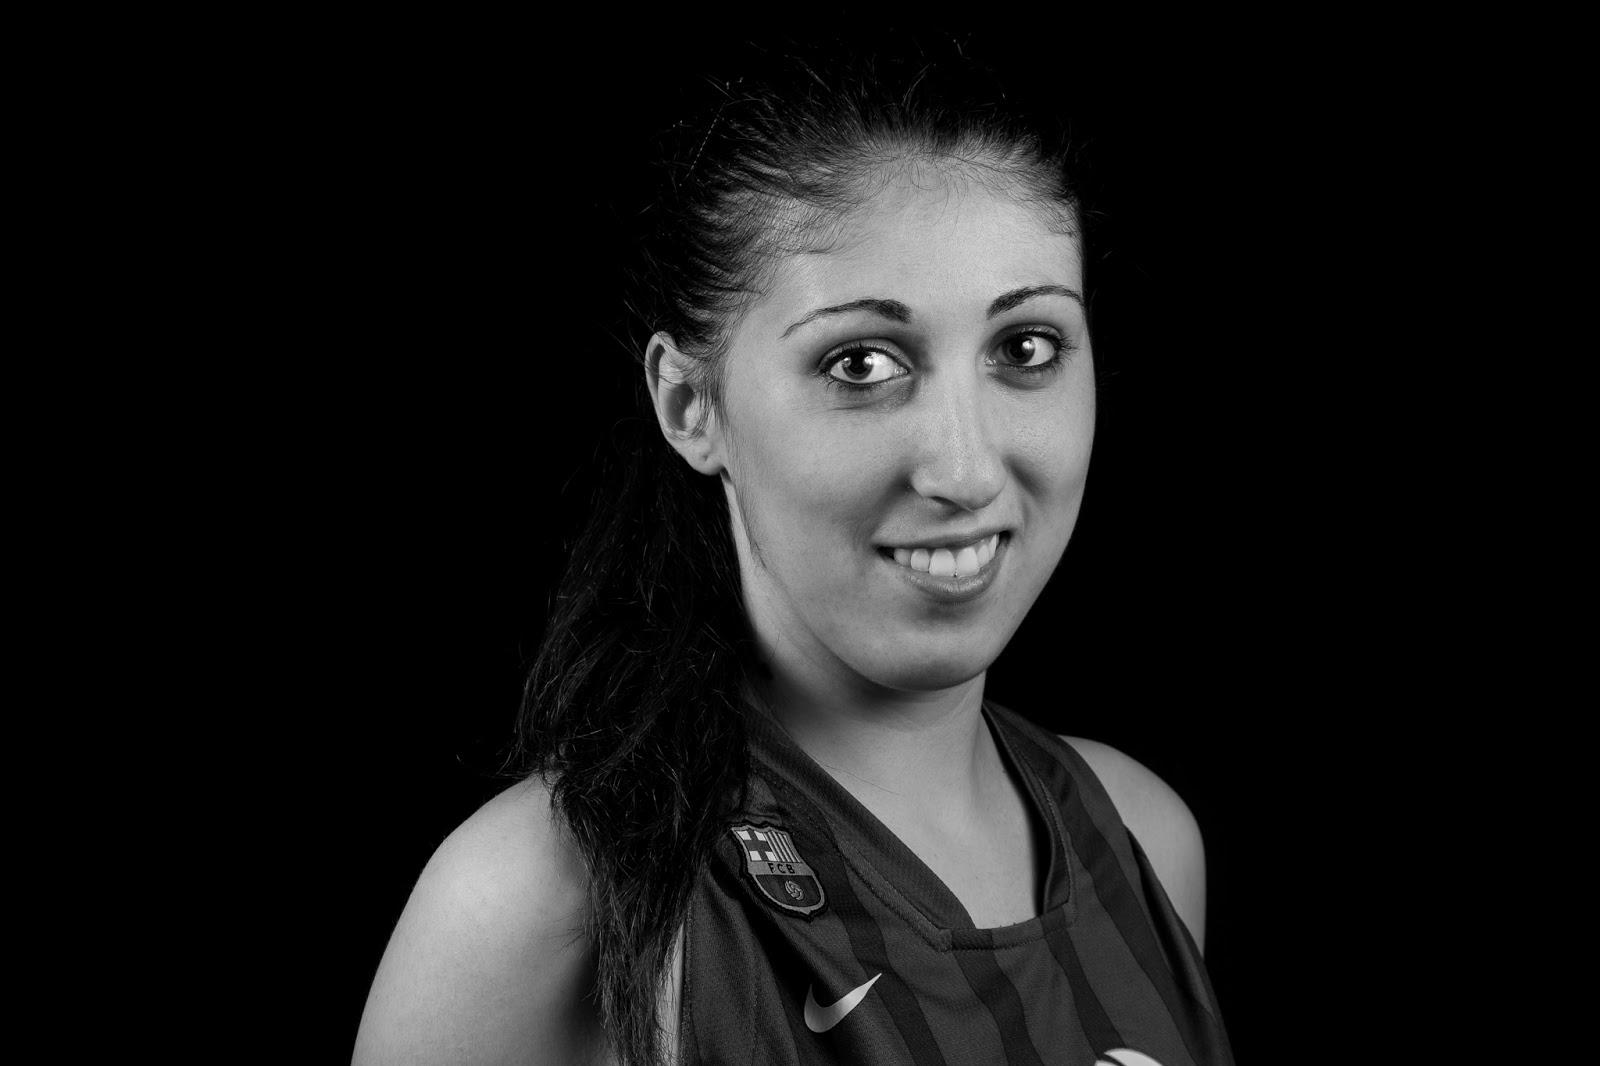 Laia 12 - CBS Barça Senior Femenino A - 2013 :: Canon EOS 5D MkIII | ISO100 | Canon 24-105 @45mm | f/11| 1/60s